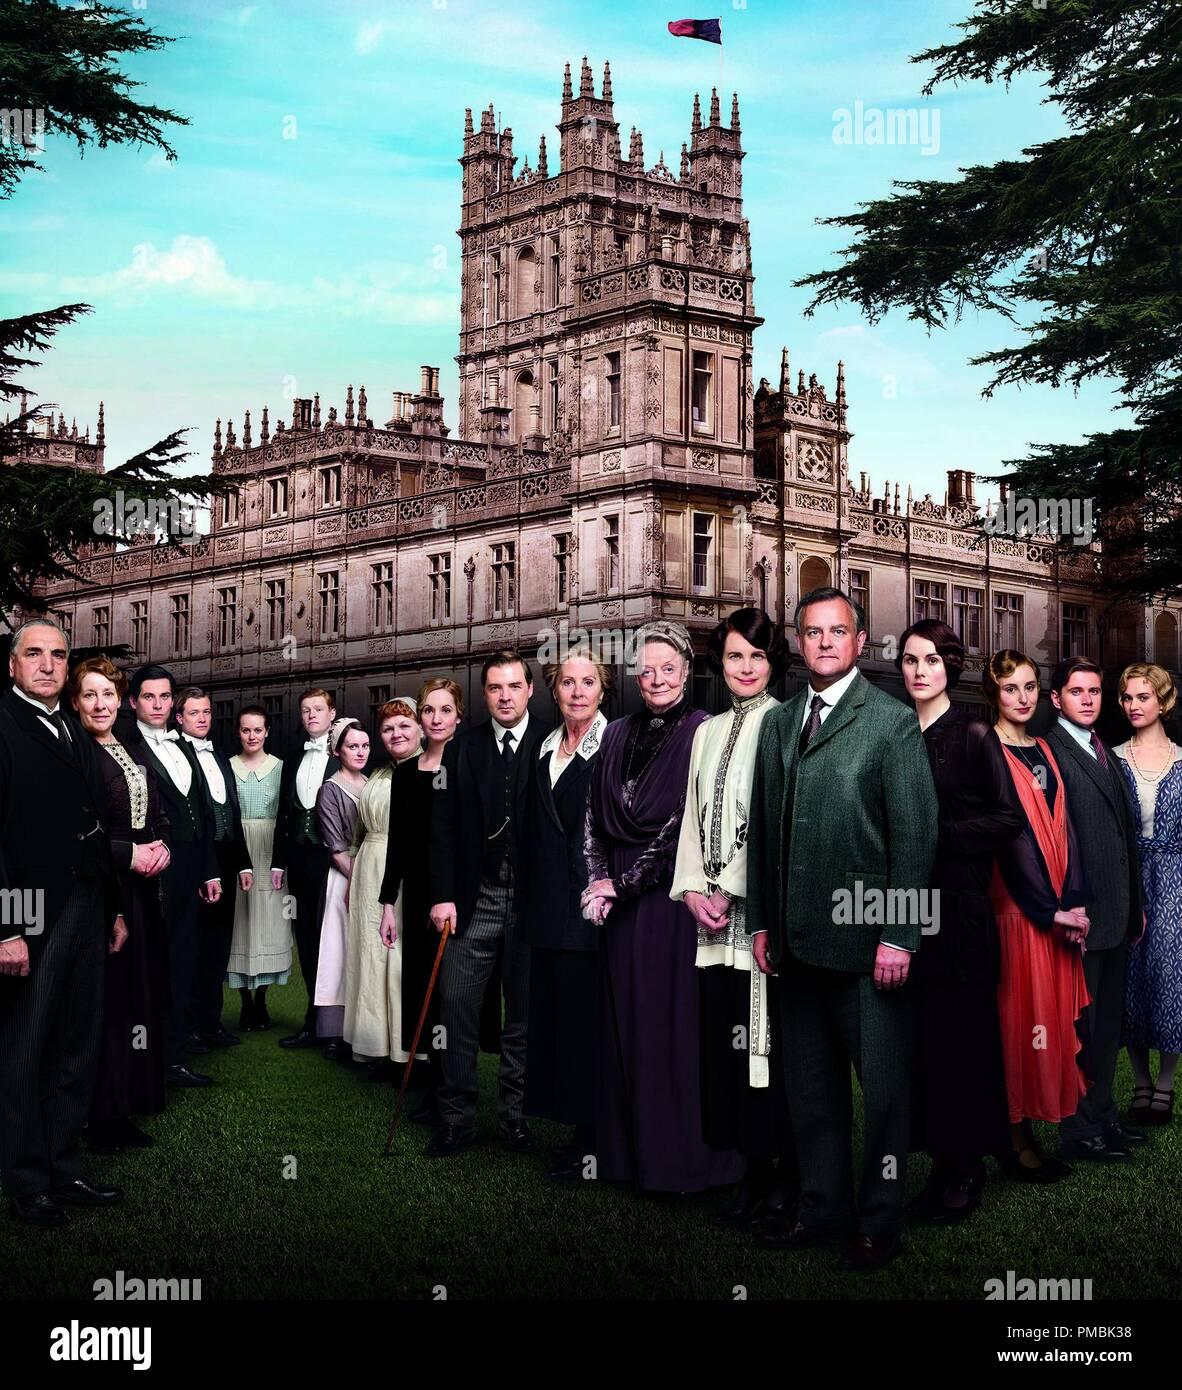 Downton Abbey Saison 4 Saison 4 der internationalen Hit Downton ...